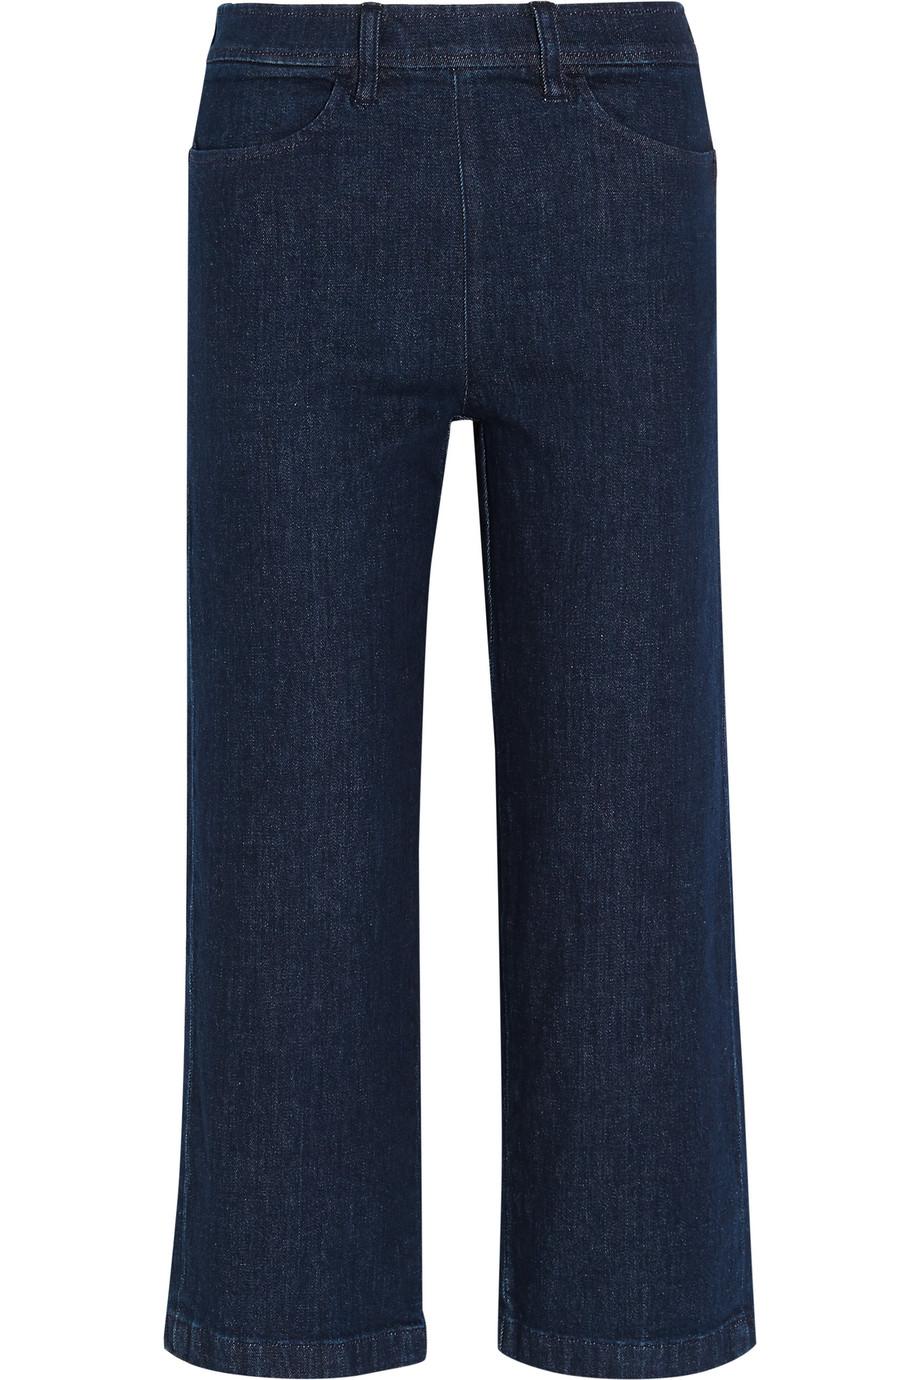 J.Crew Rayner Cropped High-Rise Wide-Leg Jeans, Dark Denim, Women's, Size: 24